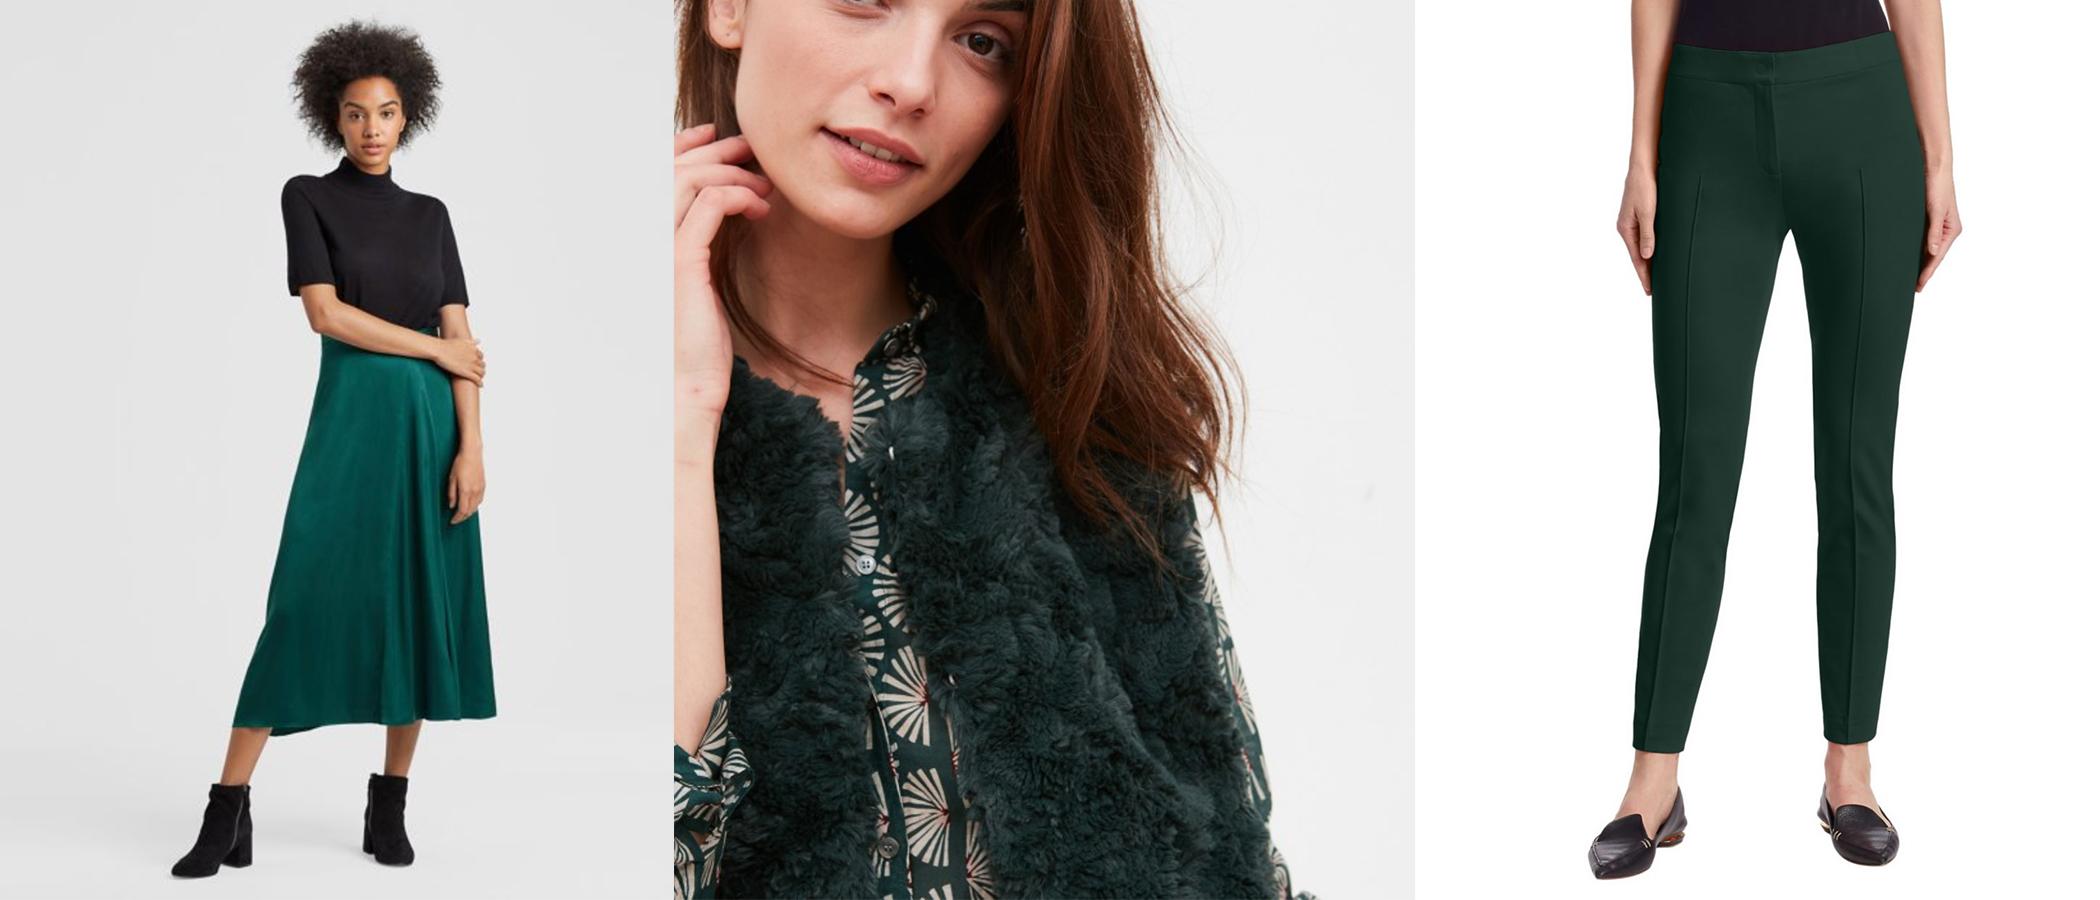 (L to R: Eileen Fisher Silk Skirt, Hartford Faux Fur Vest, Akris Punto Mara Pant)